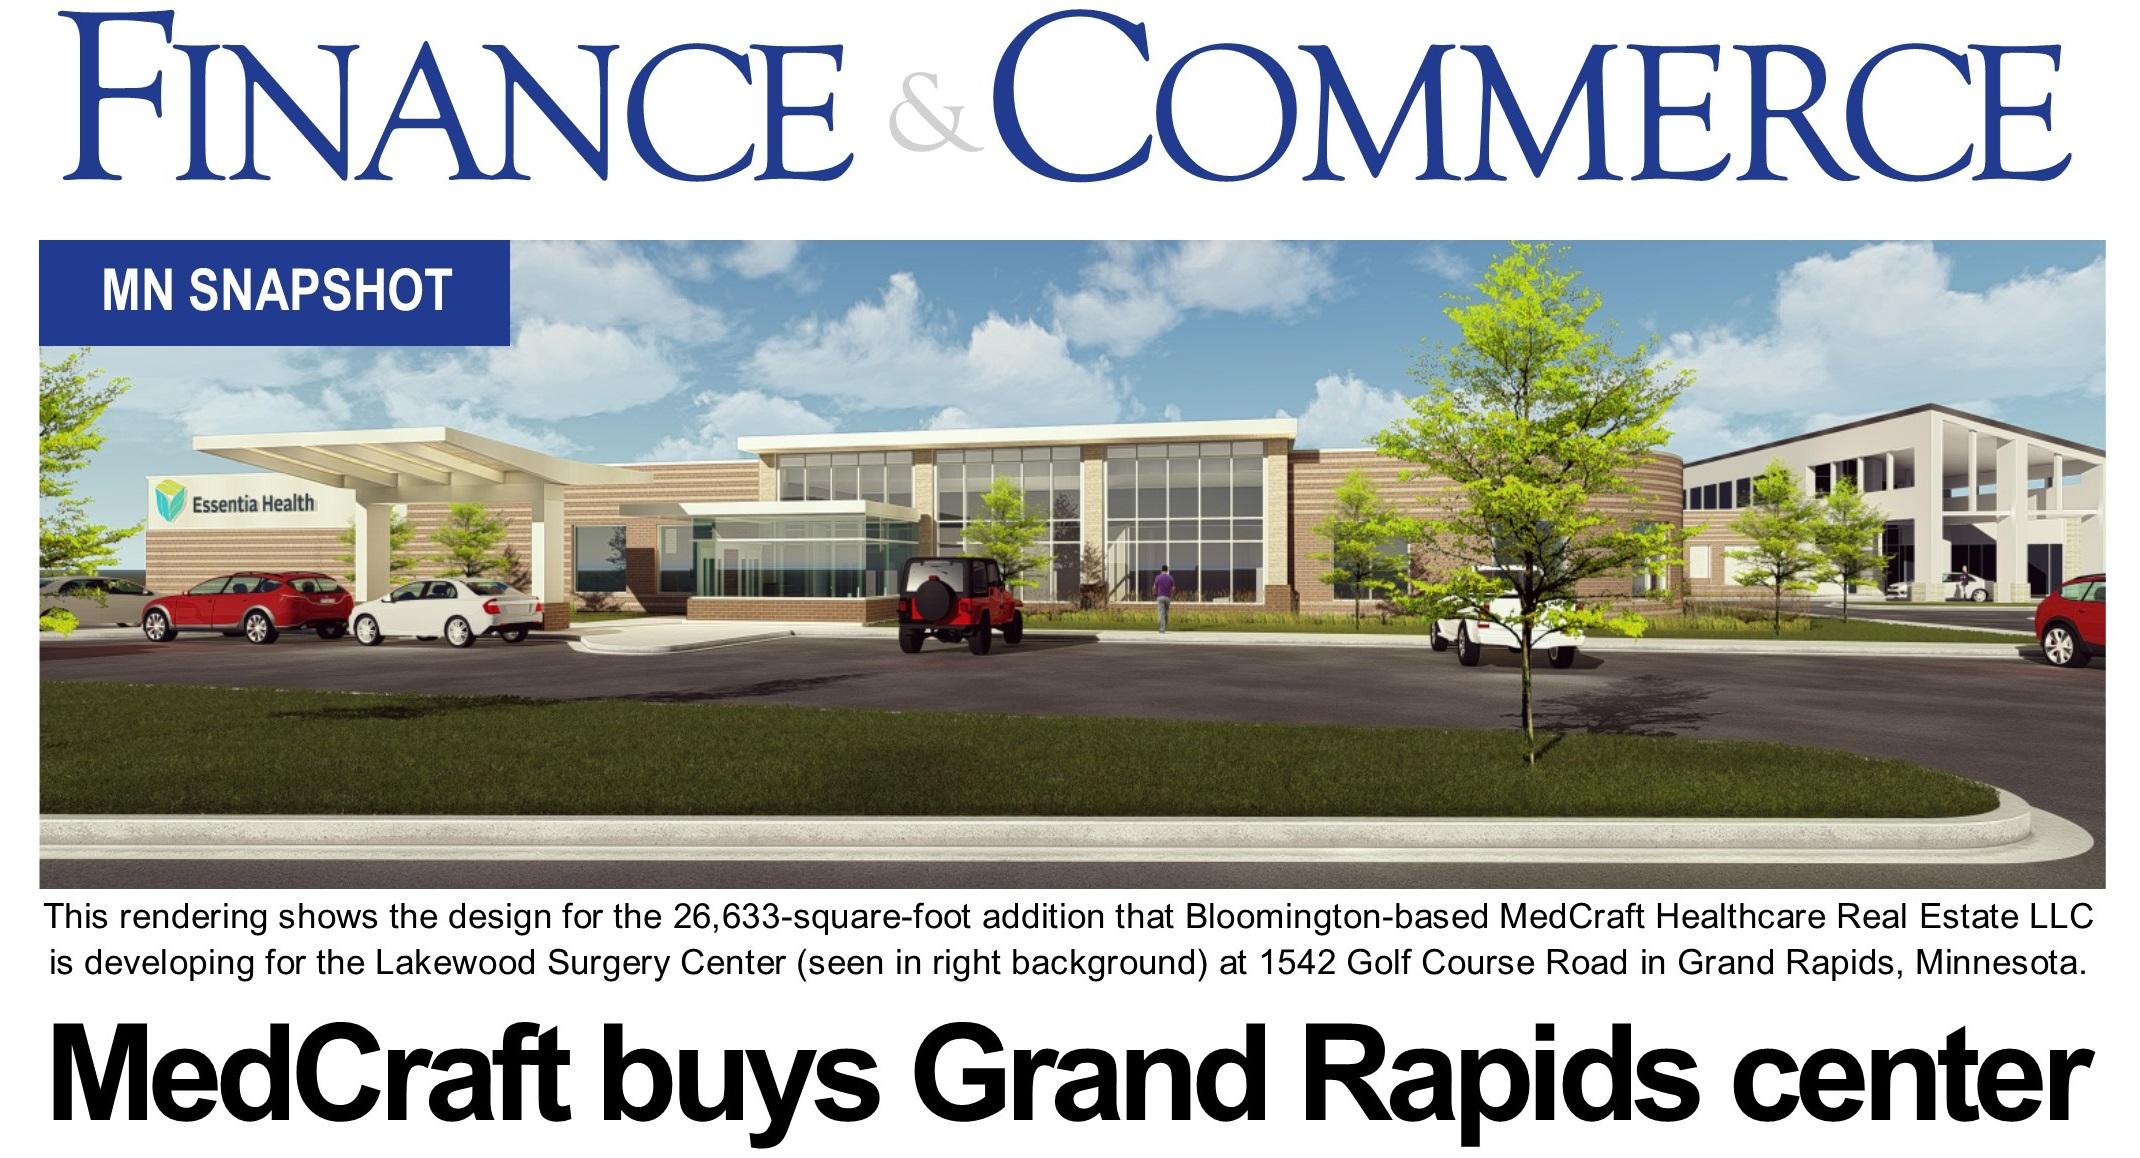 FC Grand Rapids2